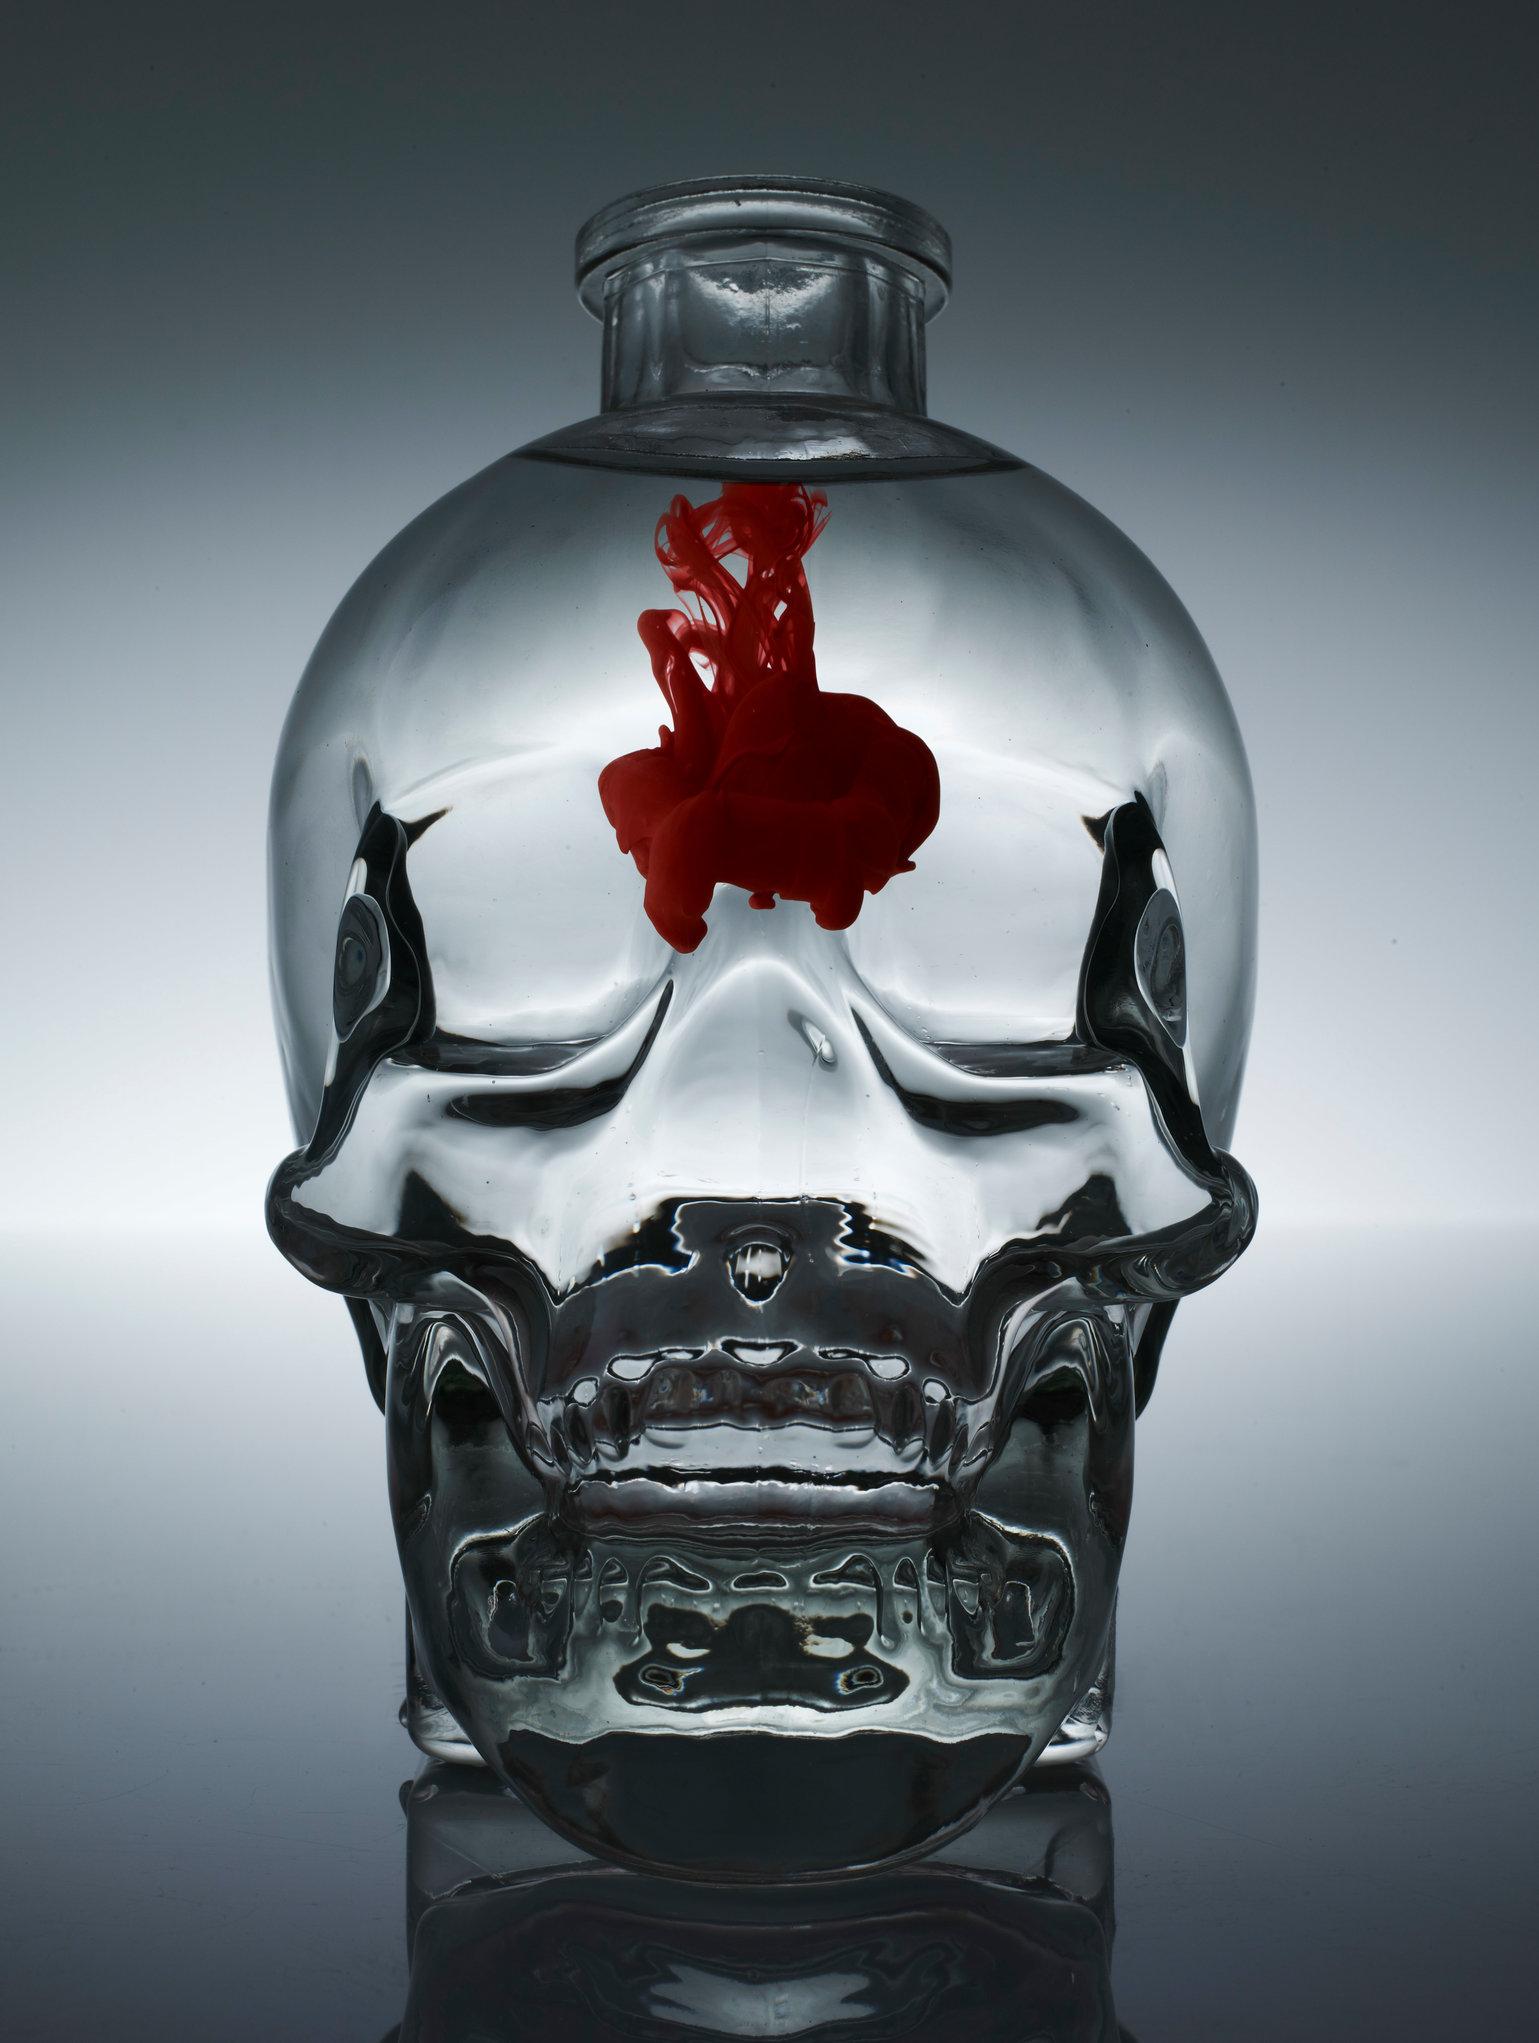 glassskull 20542 copy.jpg